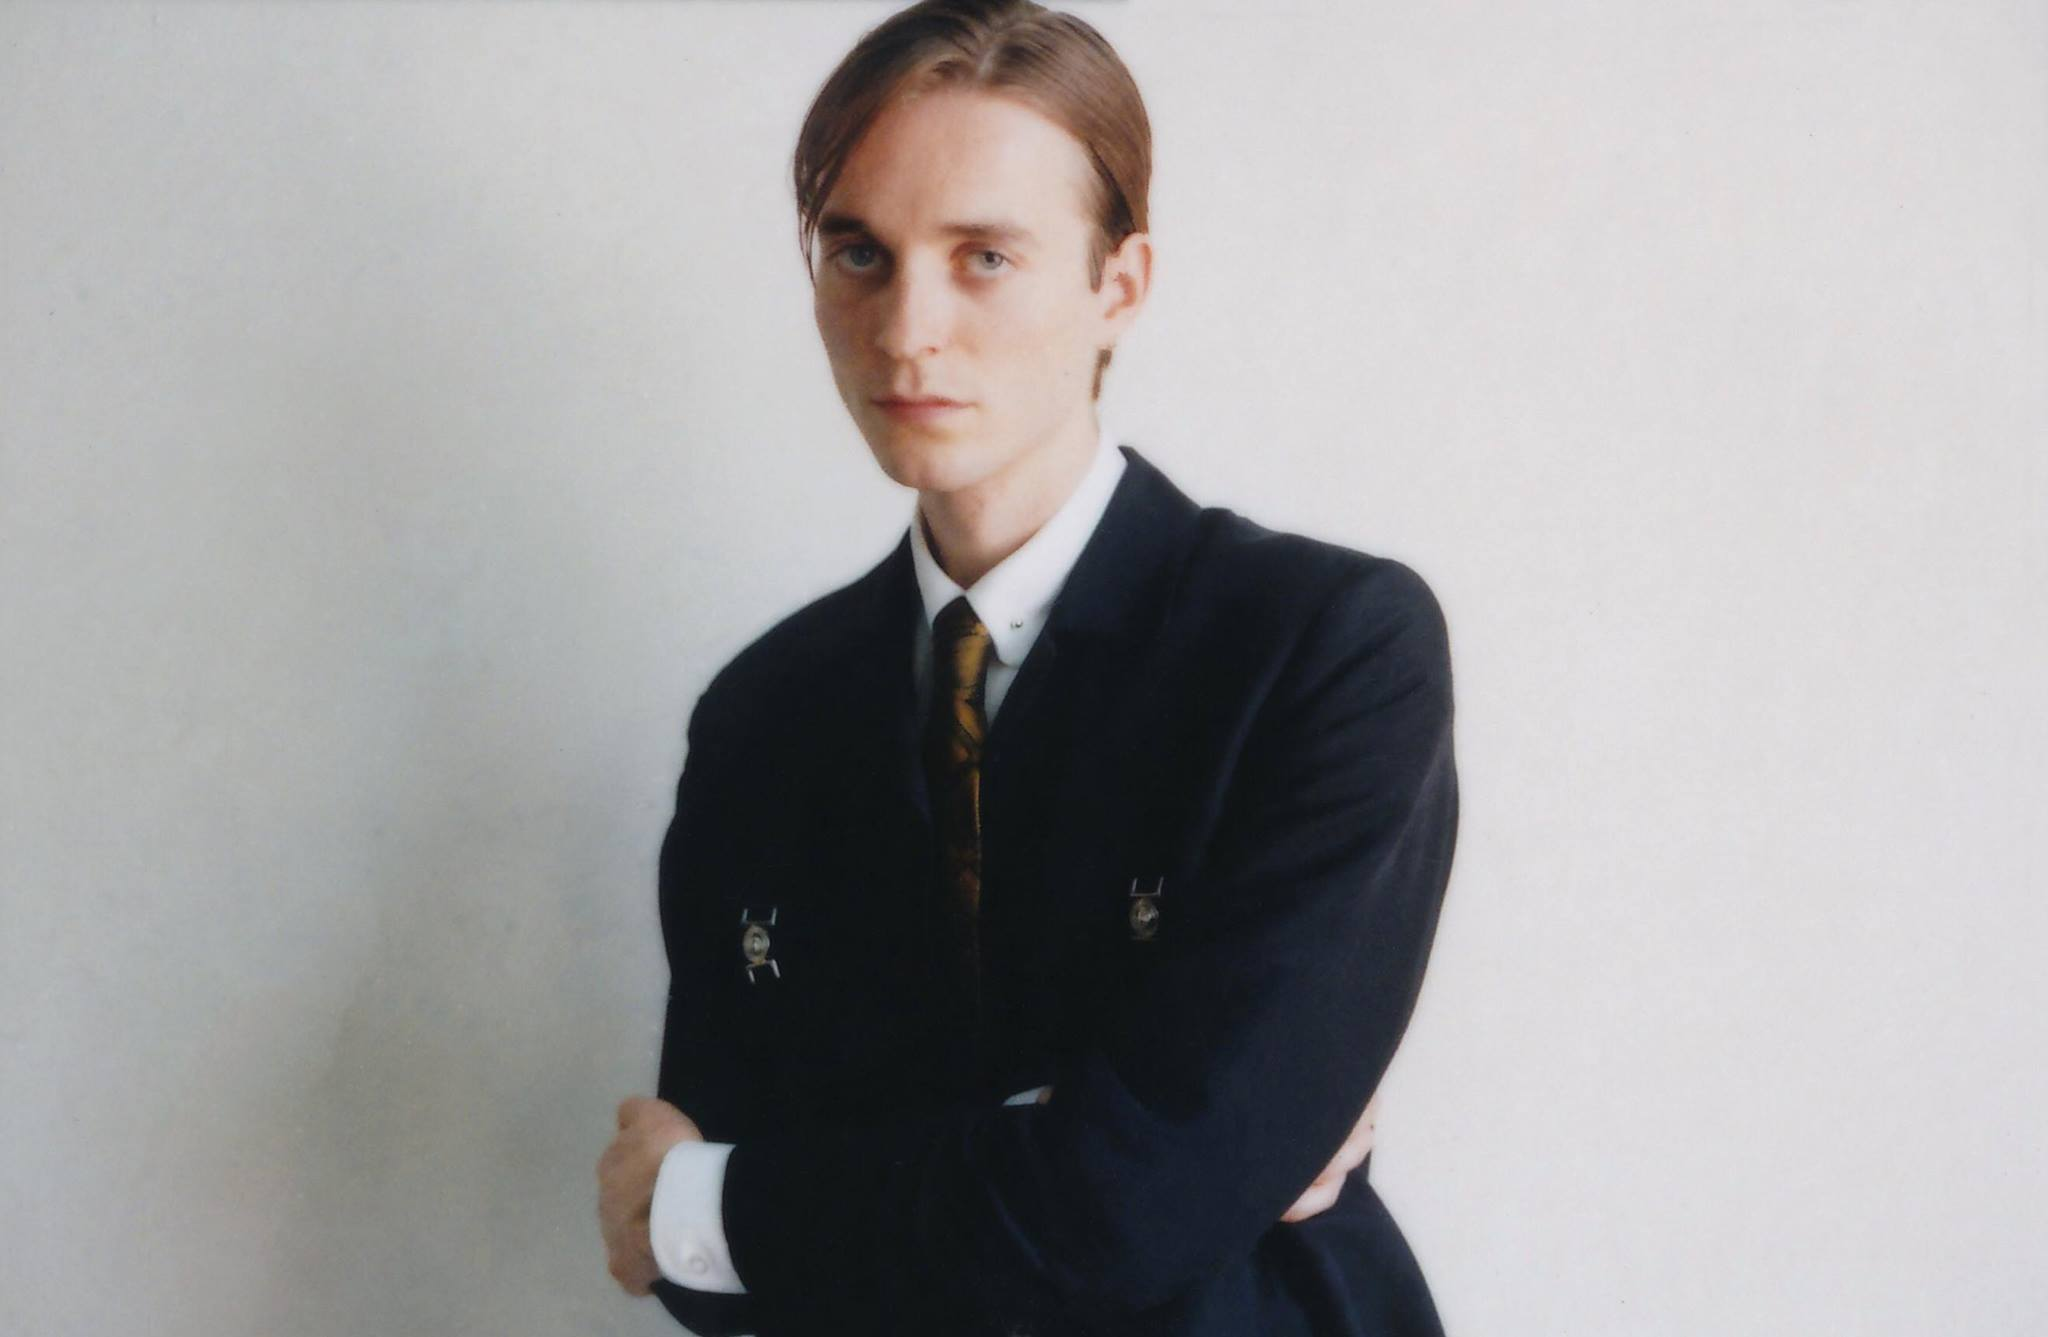 Bastian Emil Goldschmidt portæt jakkesæt